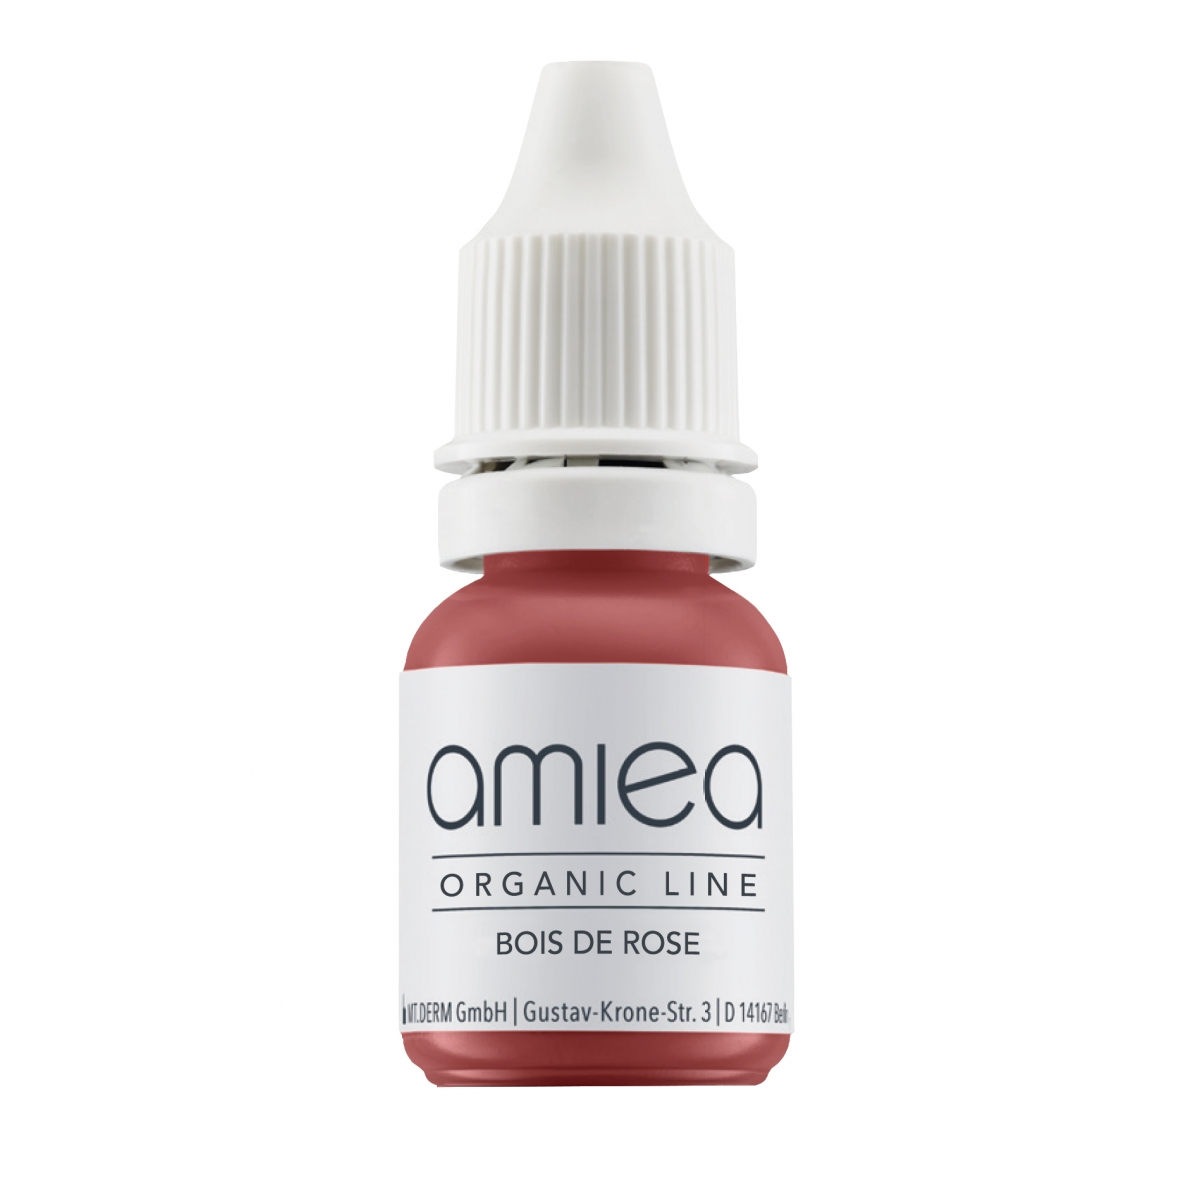 ORGANIC LINE (5ml)  - PIGMENT BOIS DE ROSE ORGANICLINE AMIEA (5 ml)